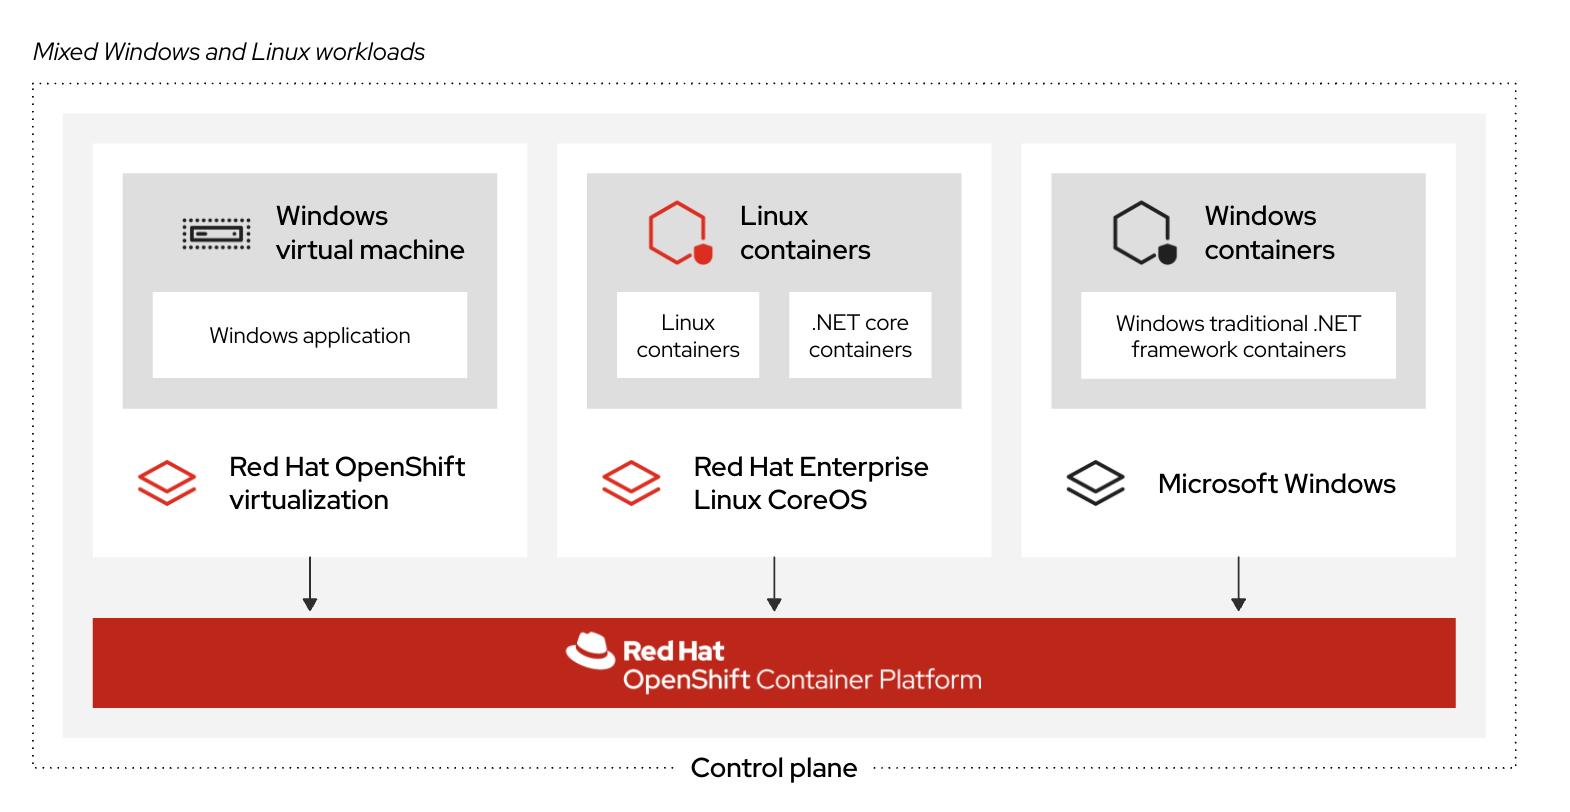 Windows applications on OpenShift, 3 ways